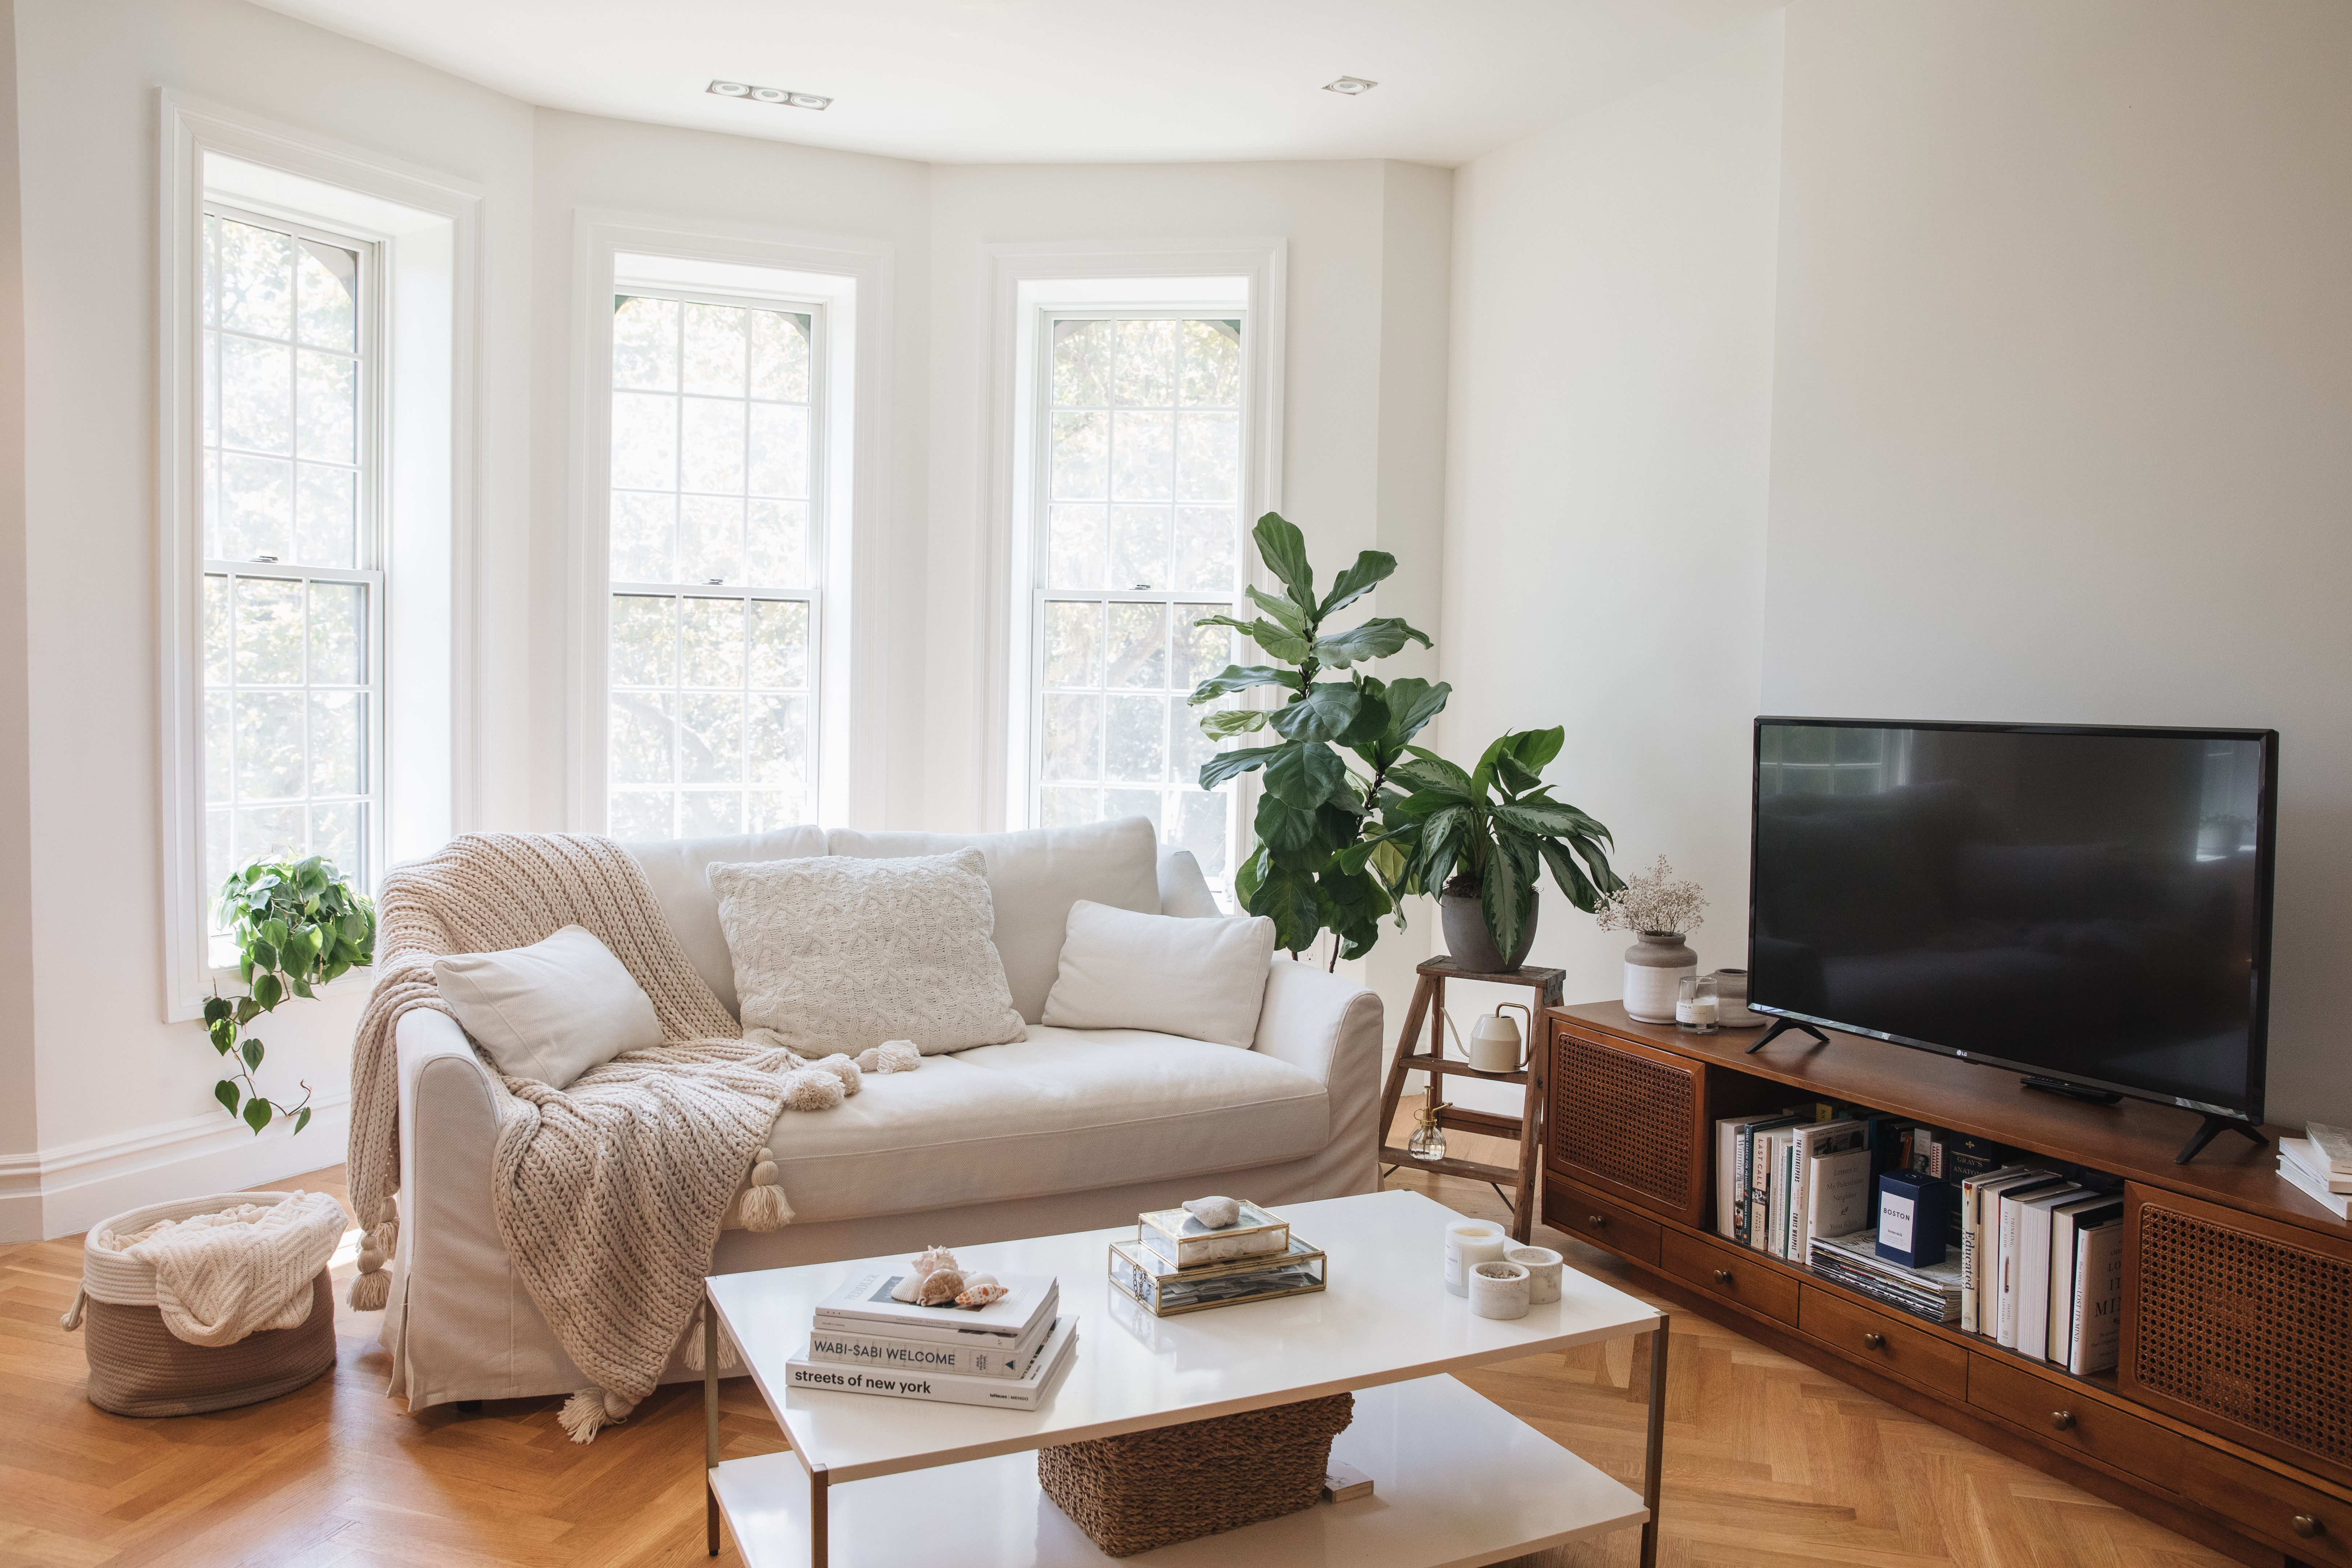 10 Rules For Arranging Living Room Furniture Living Room Furniture Arrangement Furniture Arrangement Living Room Arrangements